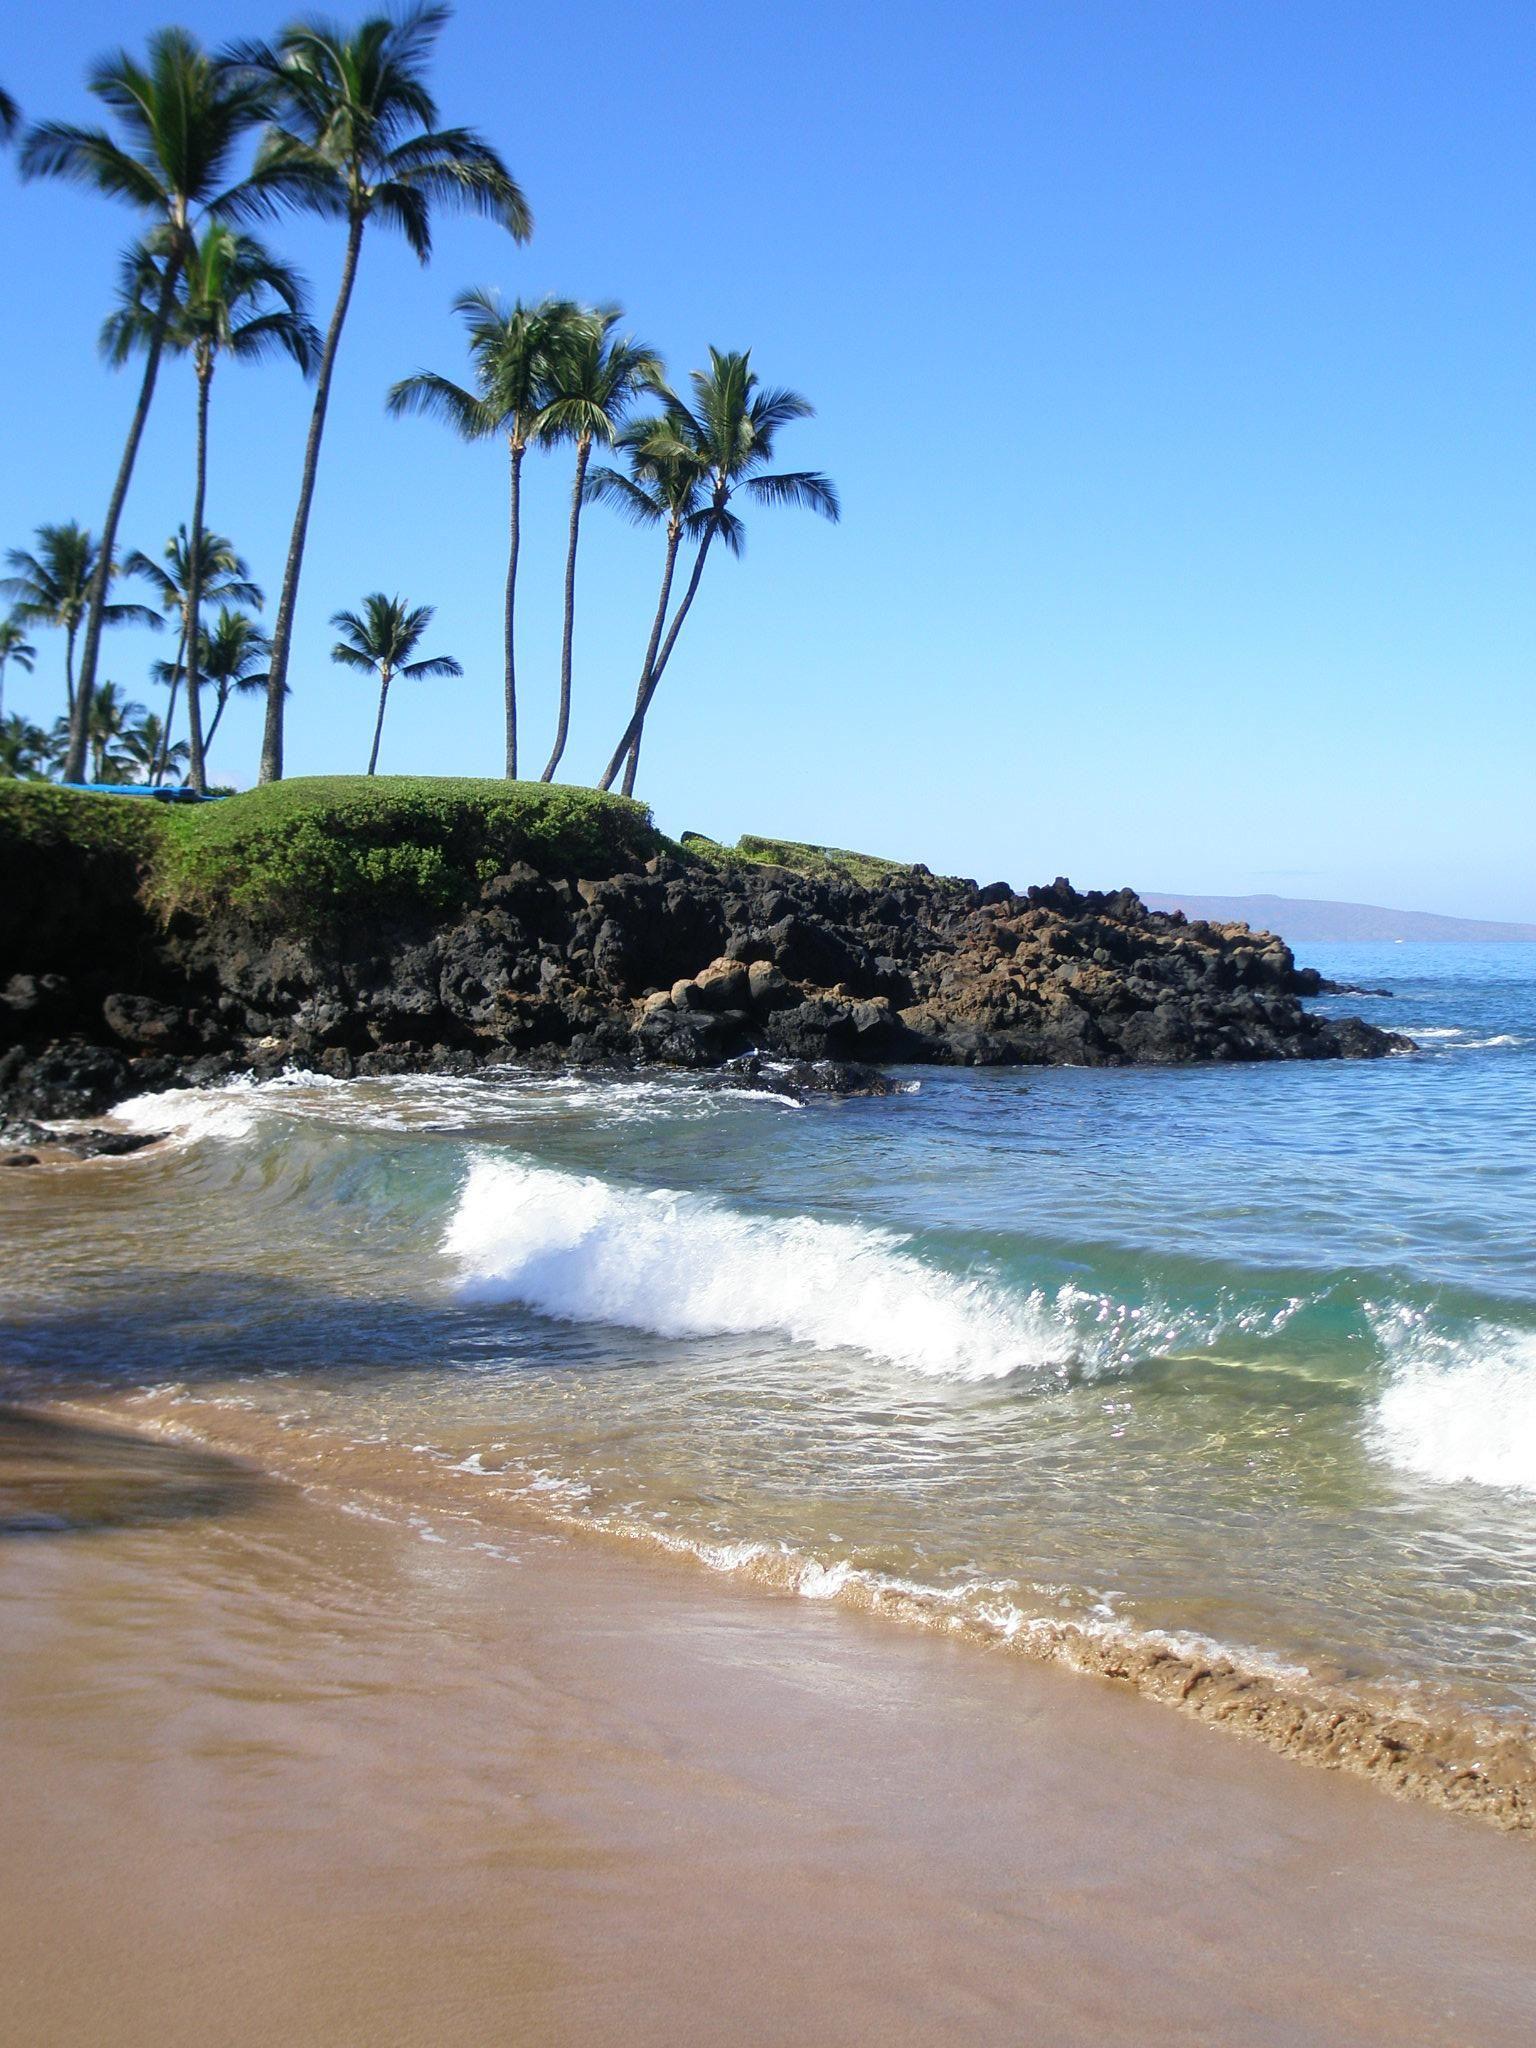 Finding The Perfect Beach Vacations Scenery Wailea maui 1536x2048